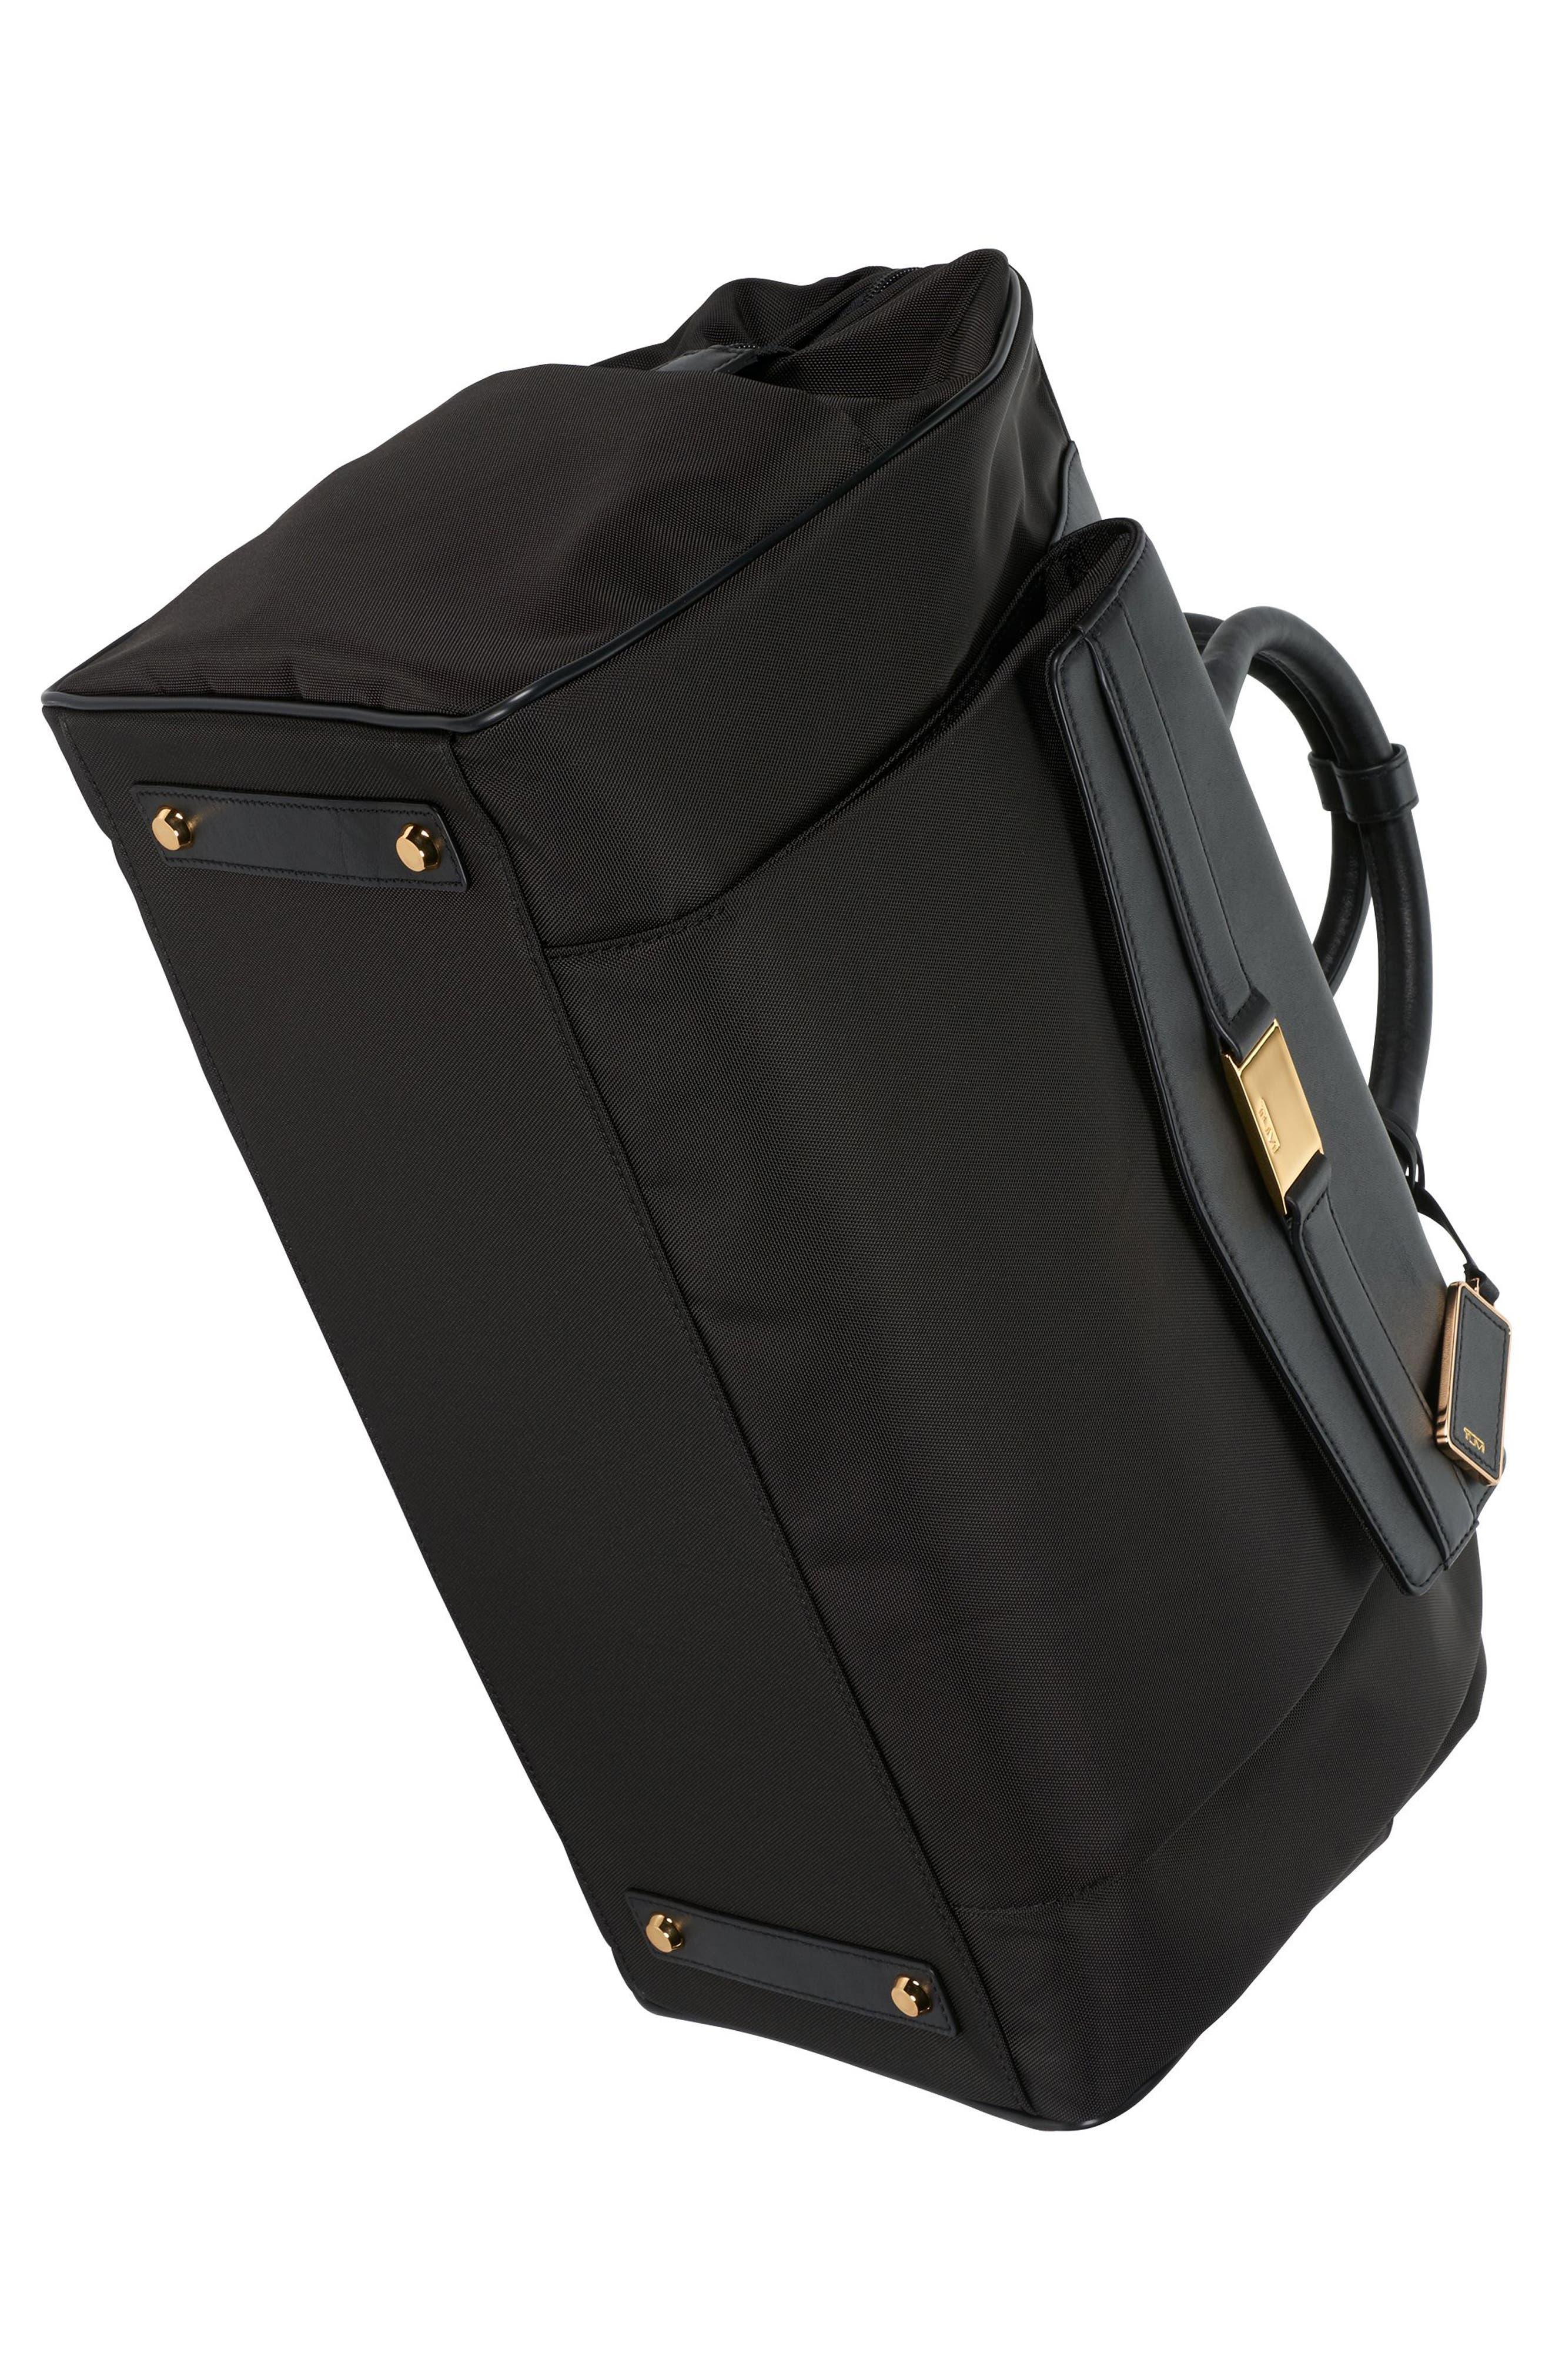 Larkin - Allendale Nylon Duffel Bag,                             Alternate thumbnail 5, color,                             001